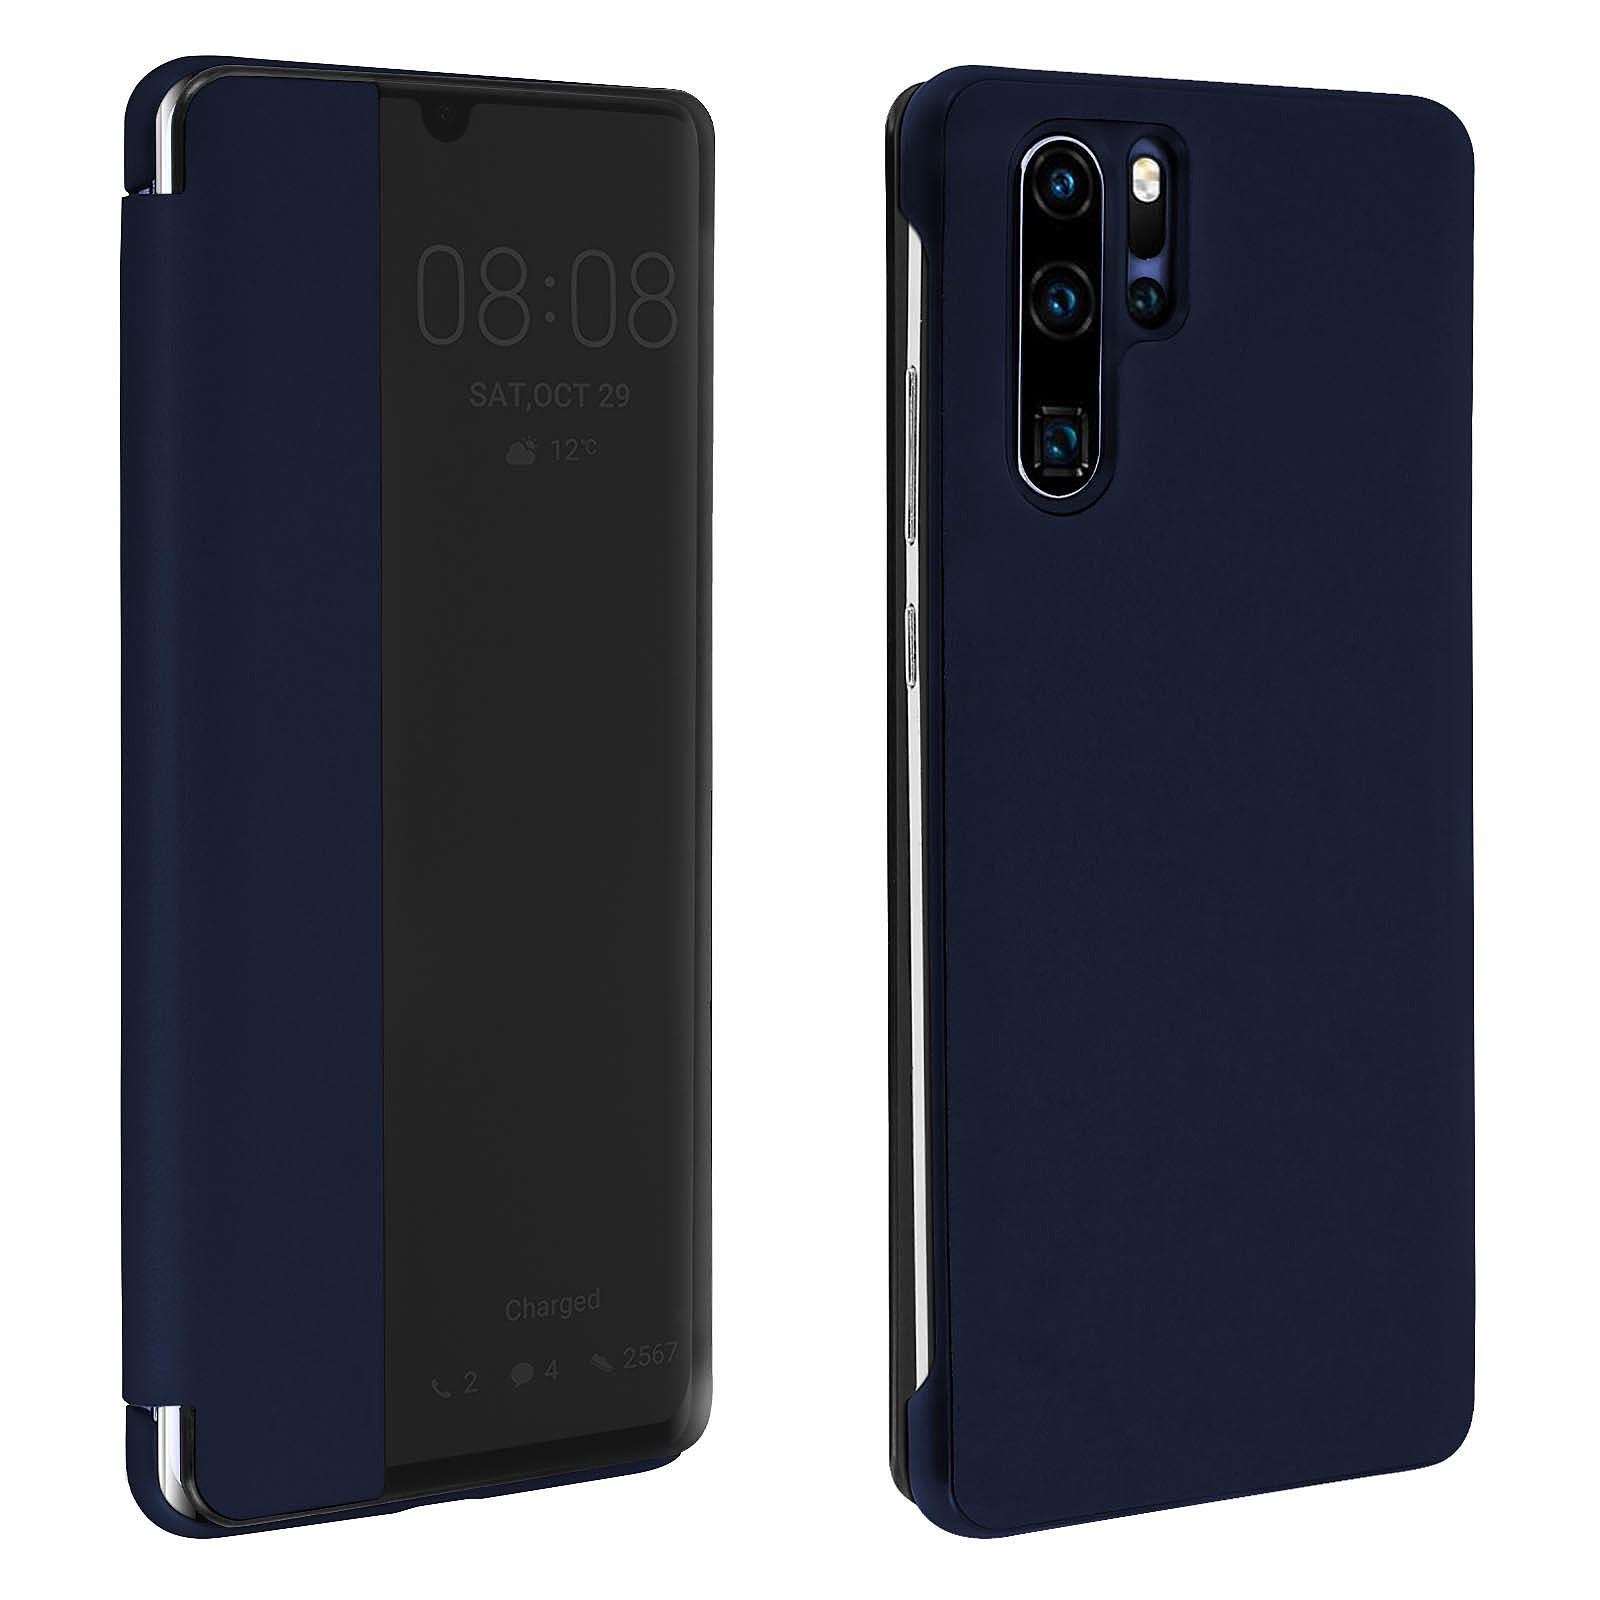 Avizar Etui folio Bleu Nuit pour Huawei P30 Pro